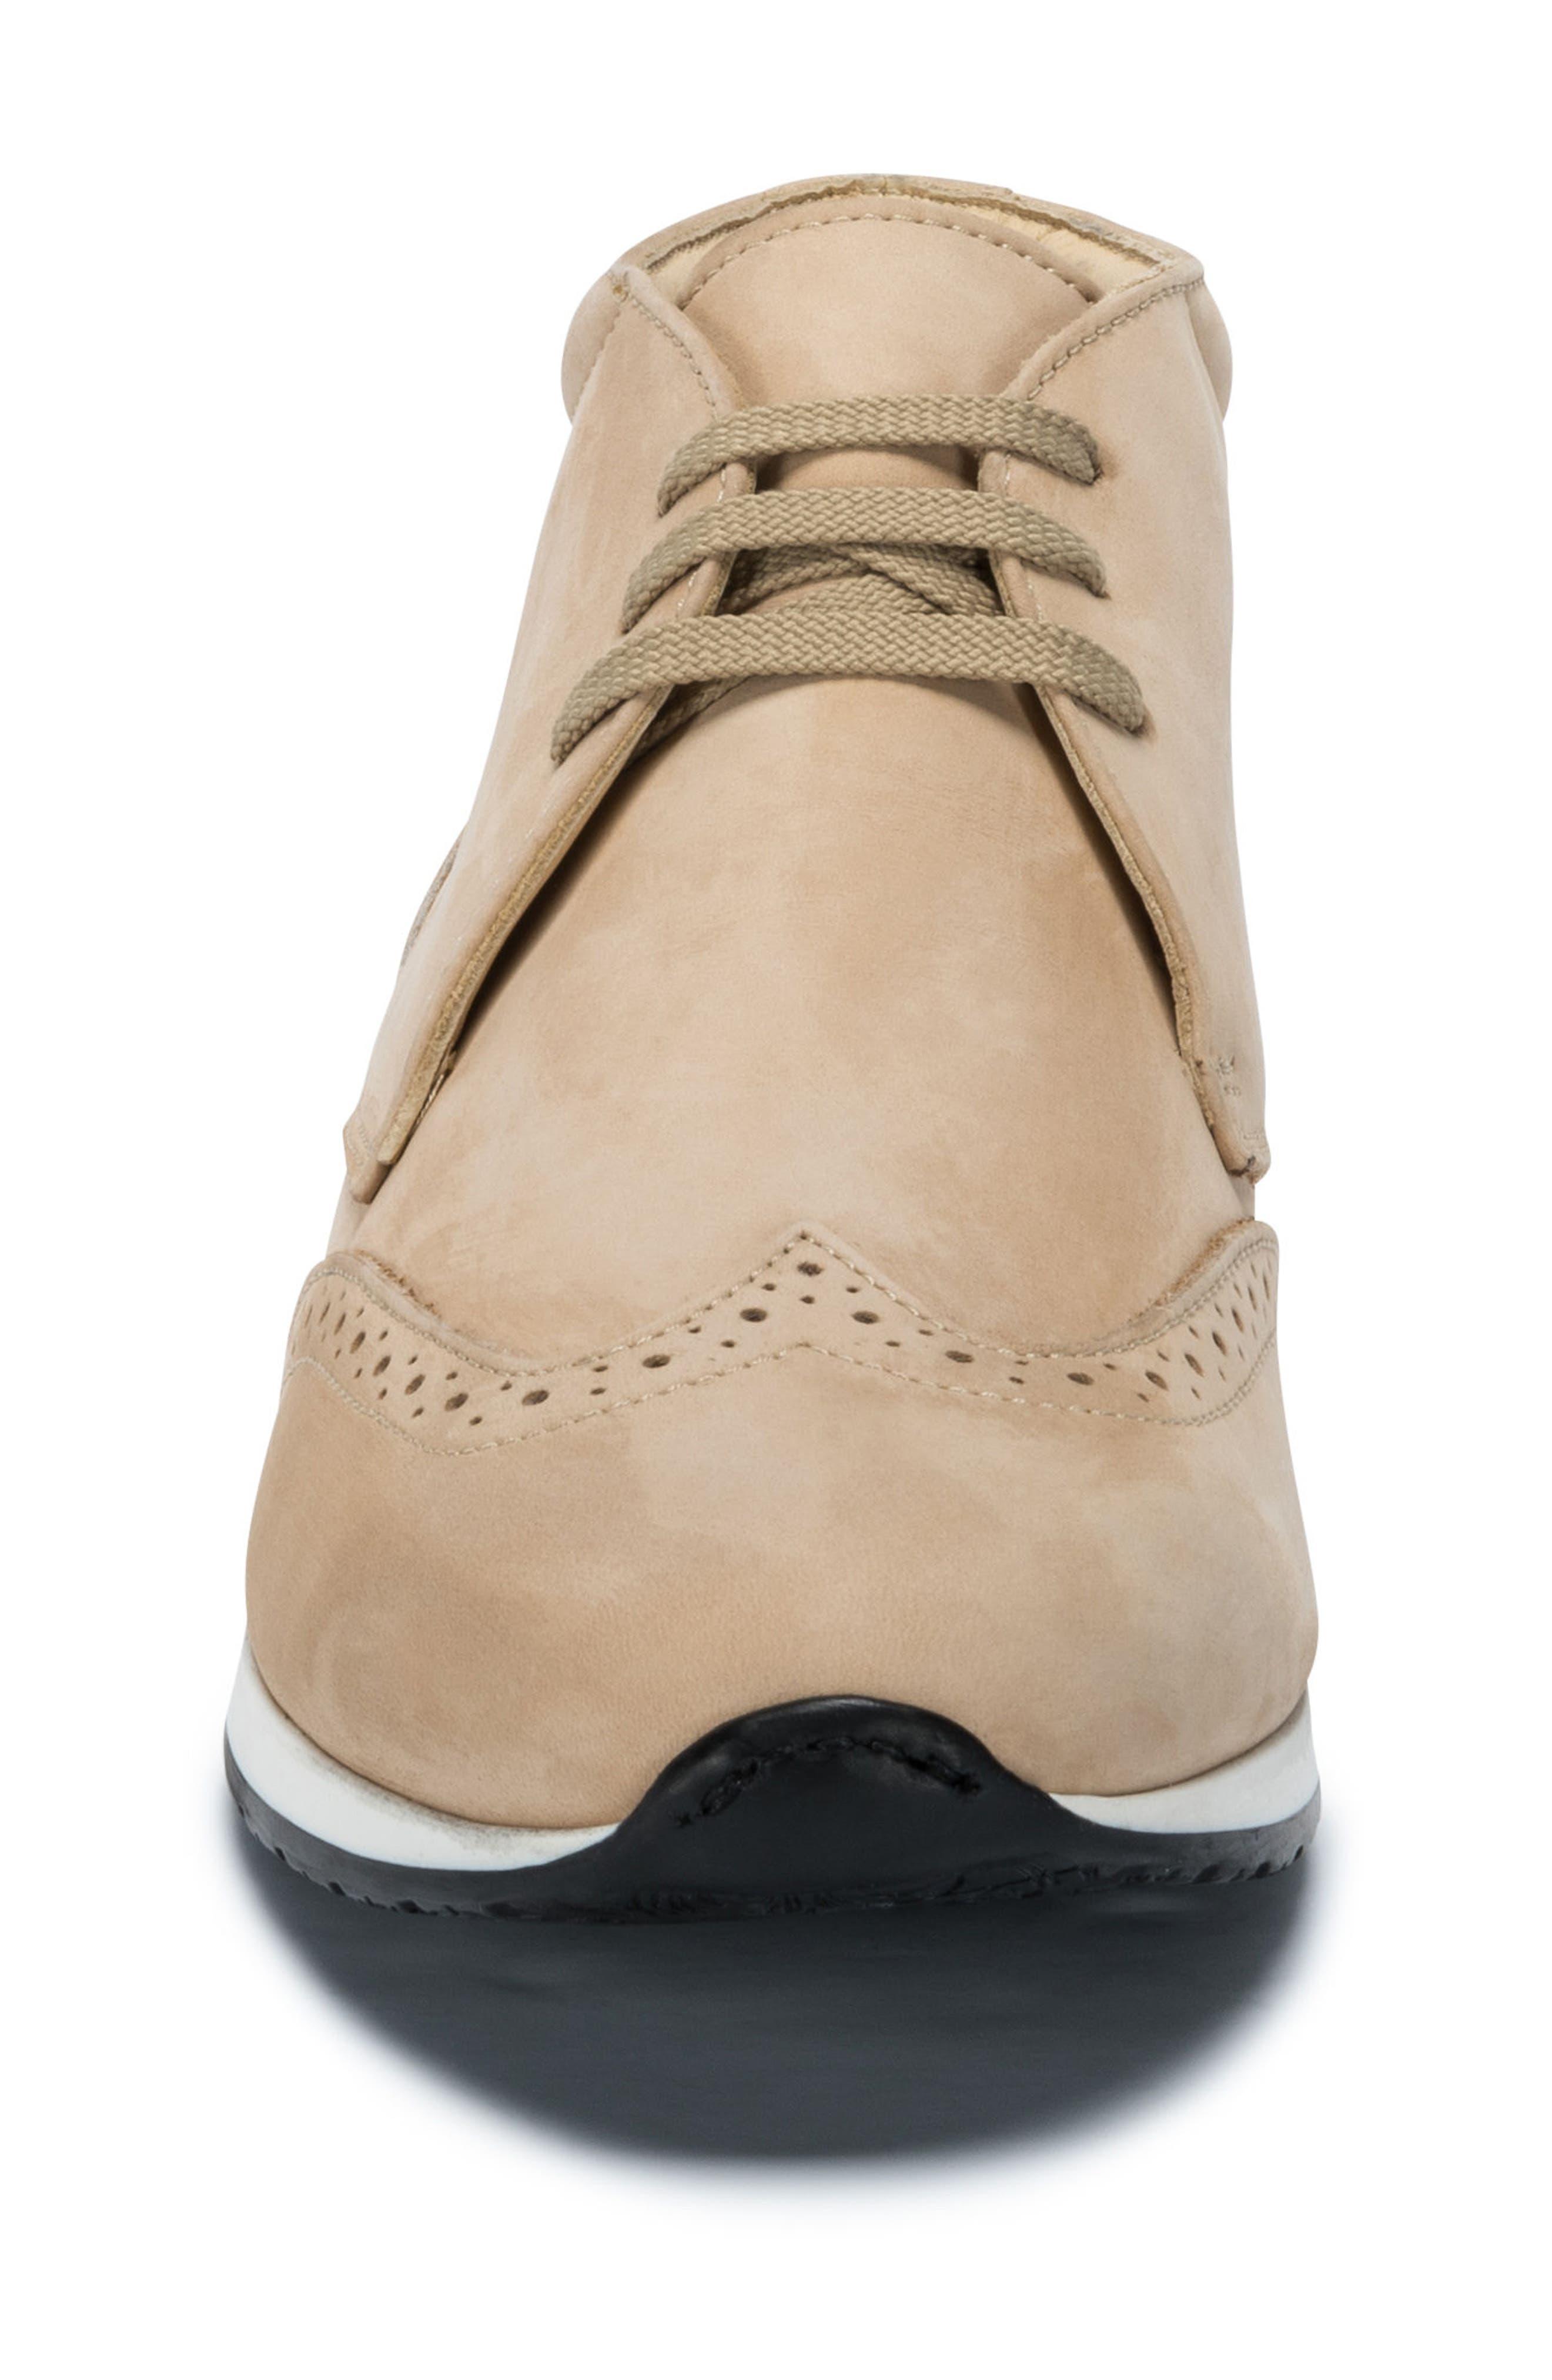 Pistoia Chukka Sneaker,                             Alternate thumbnail 4, color,                             278